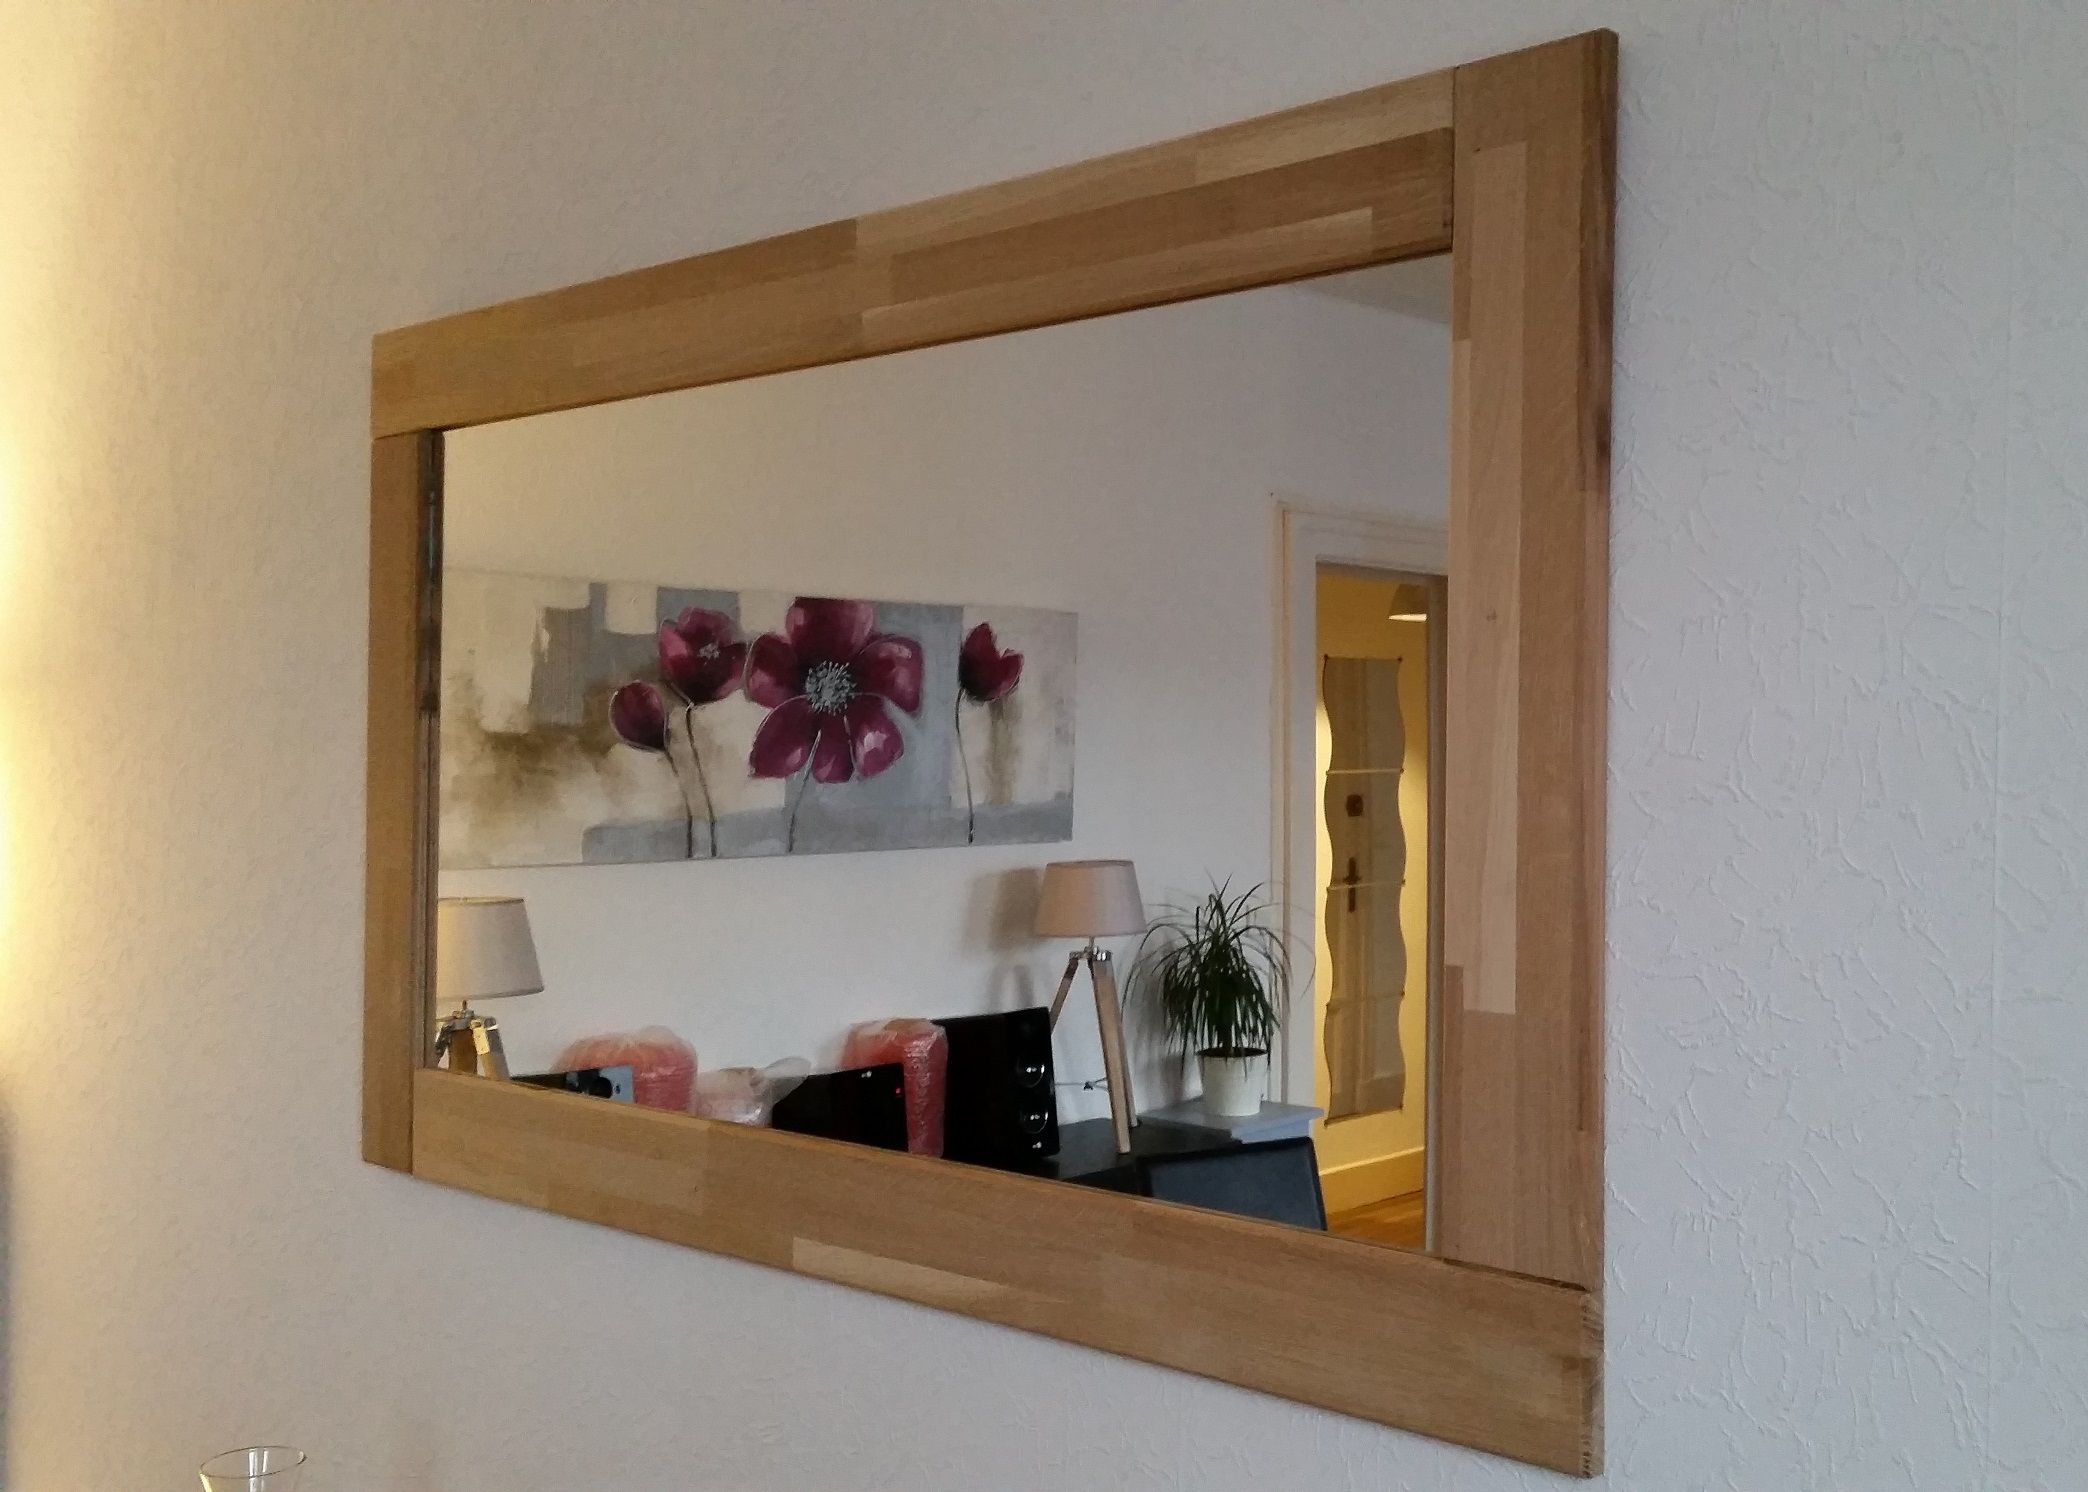 fabrication d 39 un cadre de miroir en ch ne projets essayer pinterest miroirs bosch et. Black Bedroom Furniture Sets. Home Design Ideas